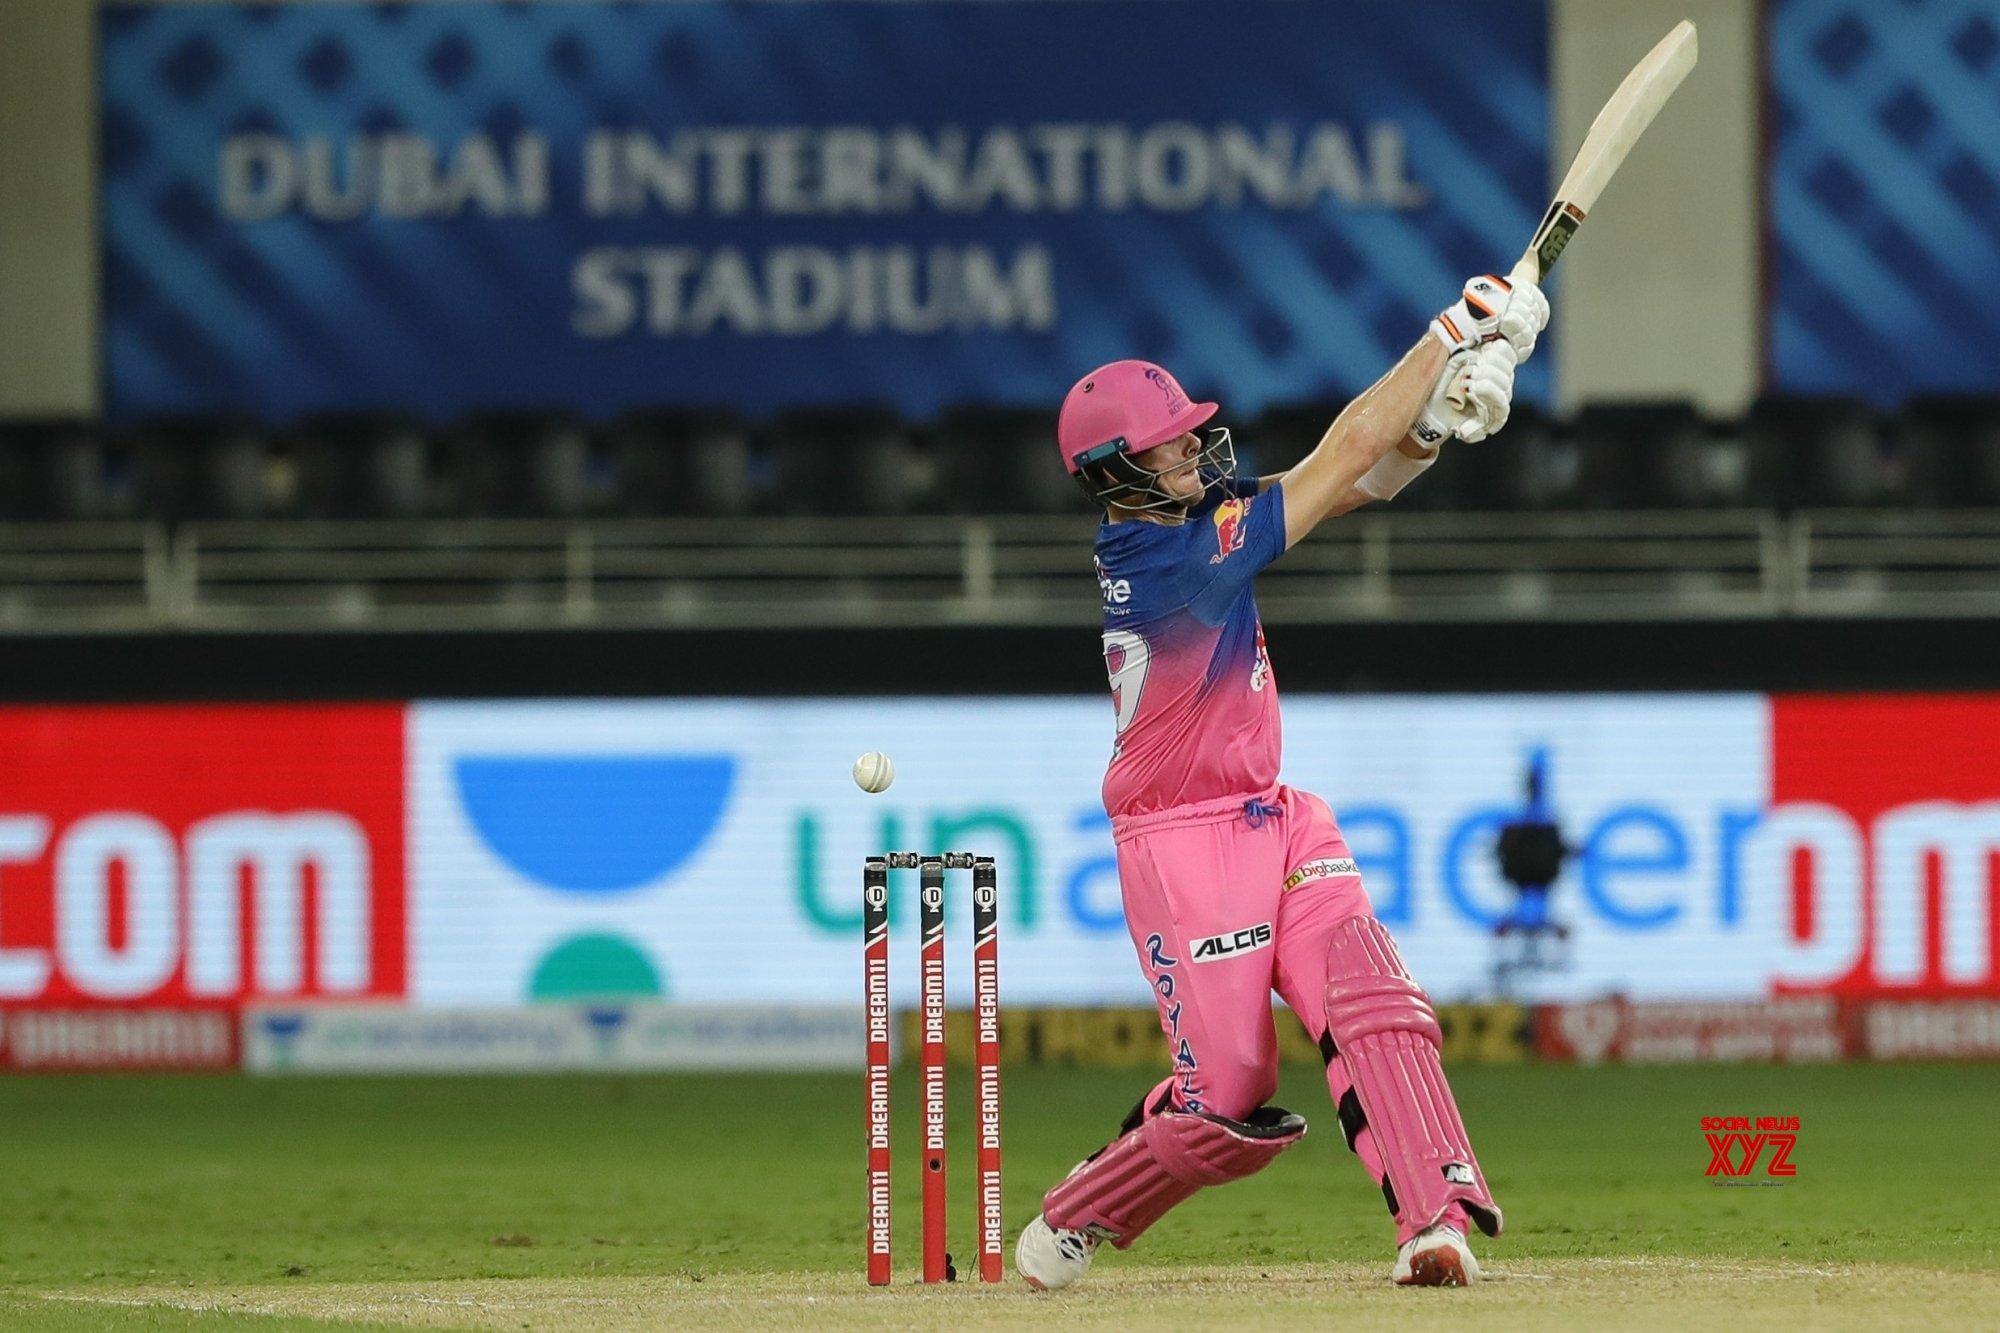 Captain Smith, Uthappa take Rajasthan to 177/6 vs RCB